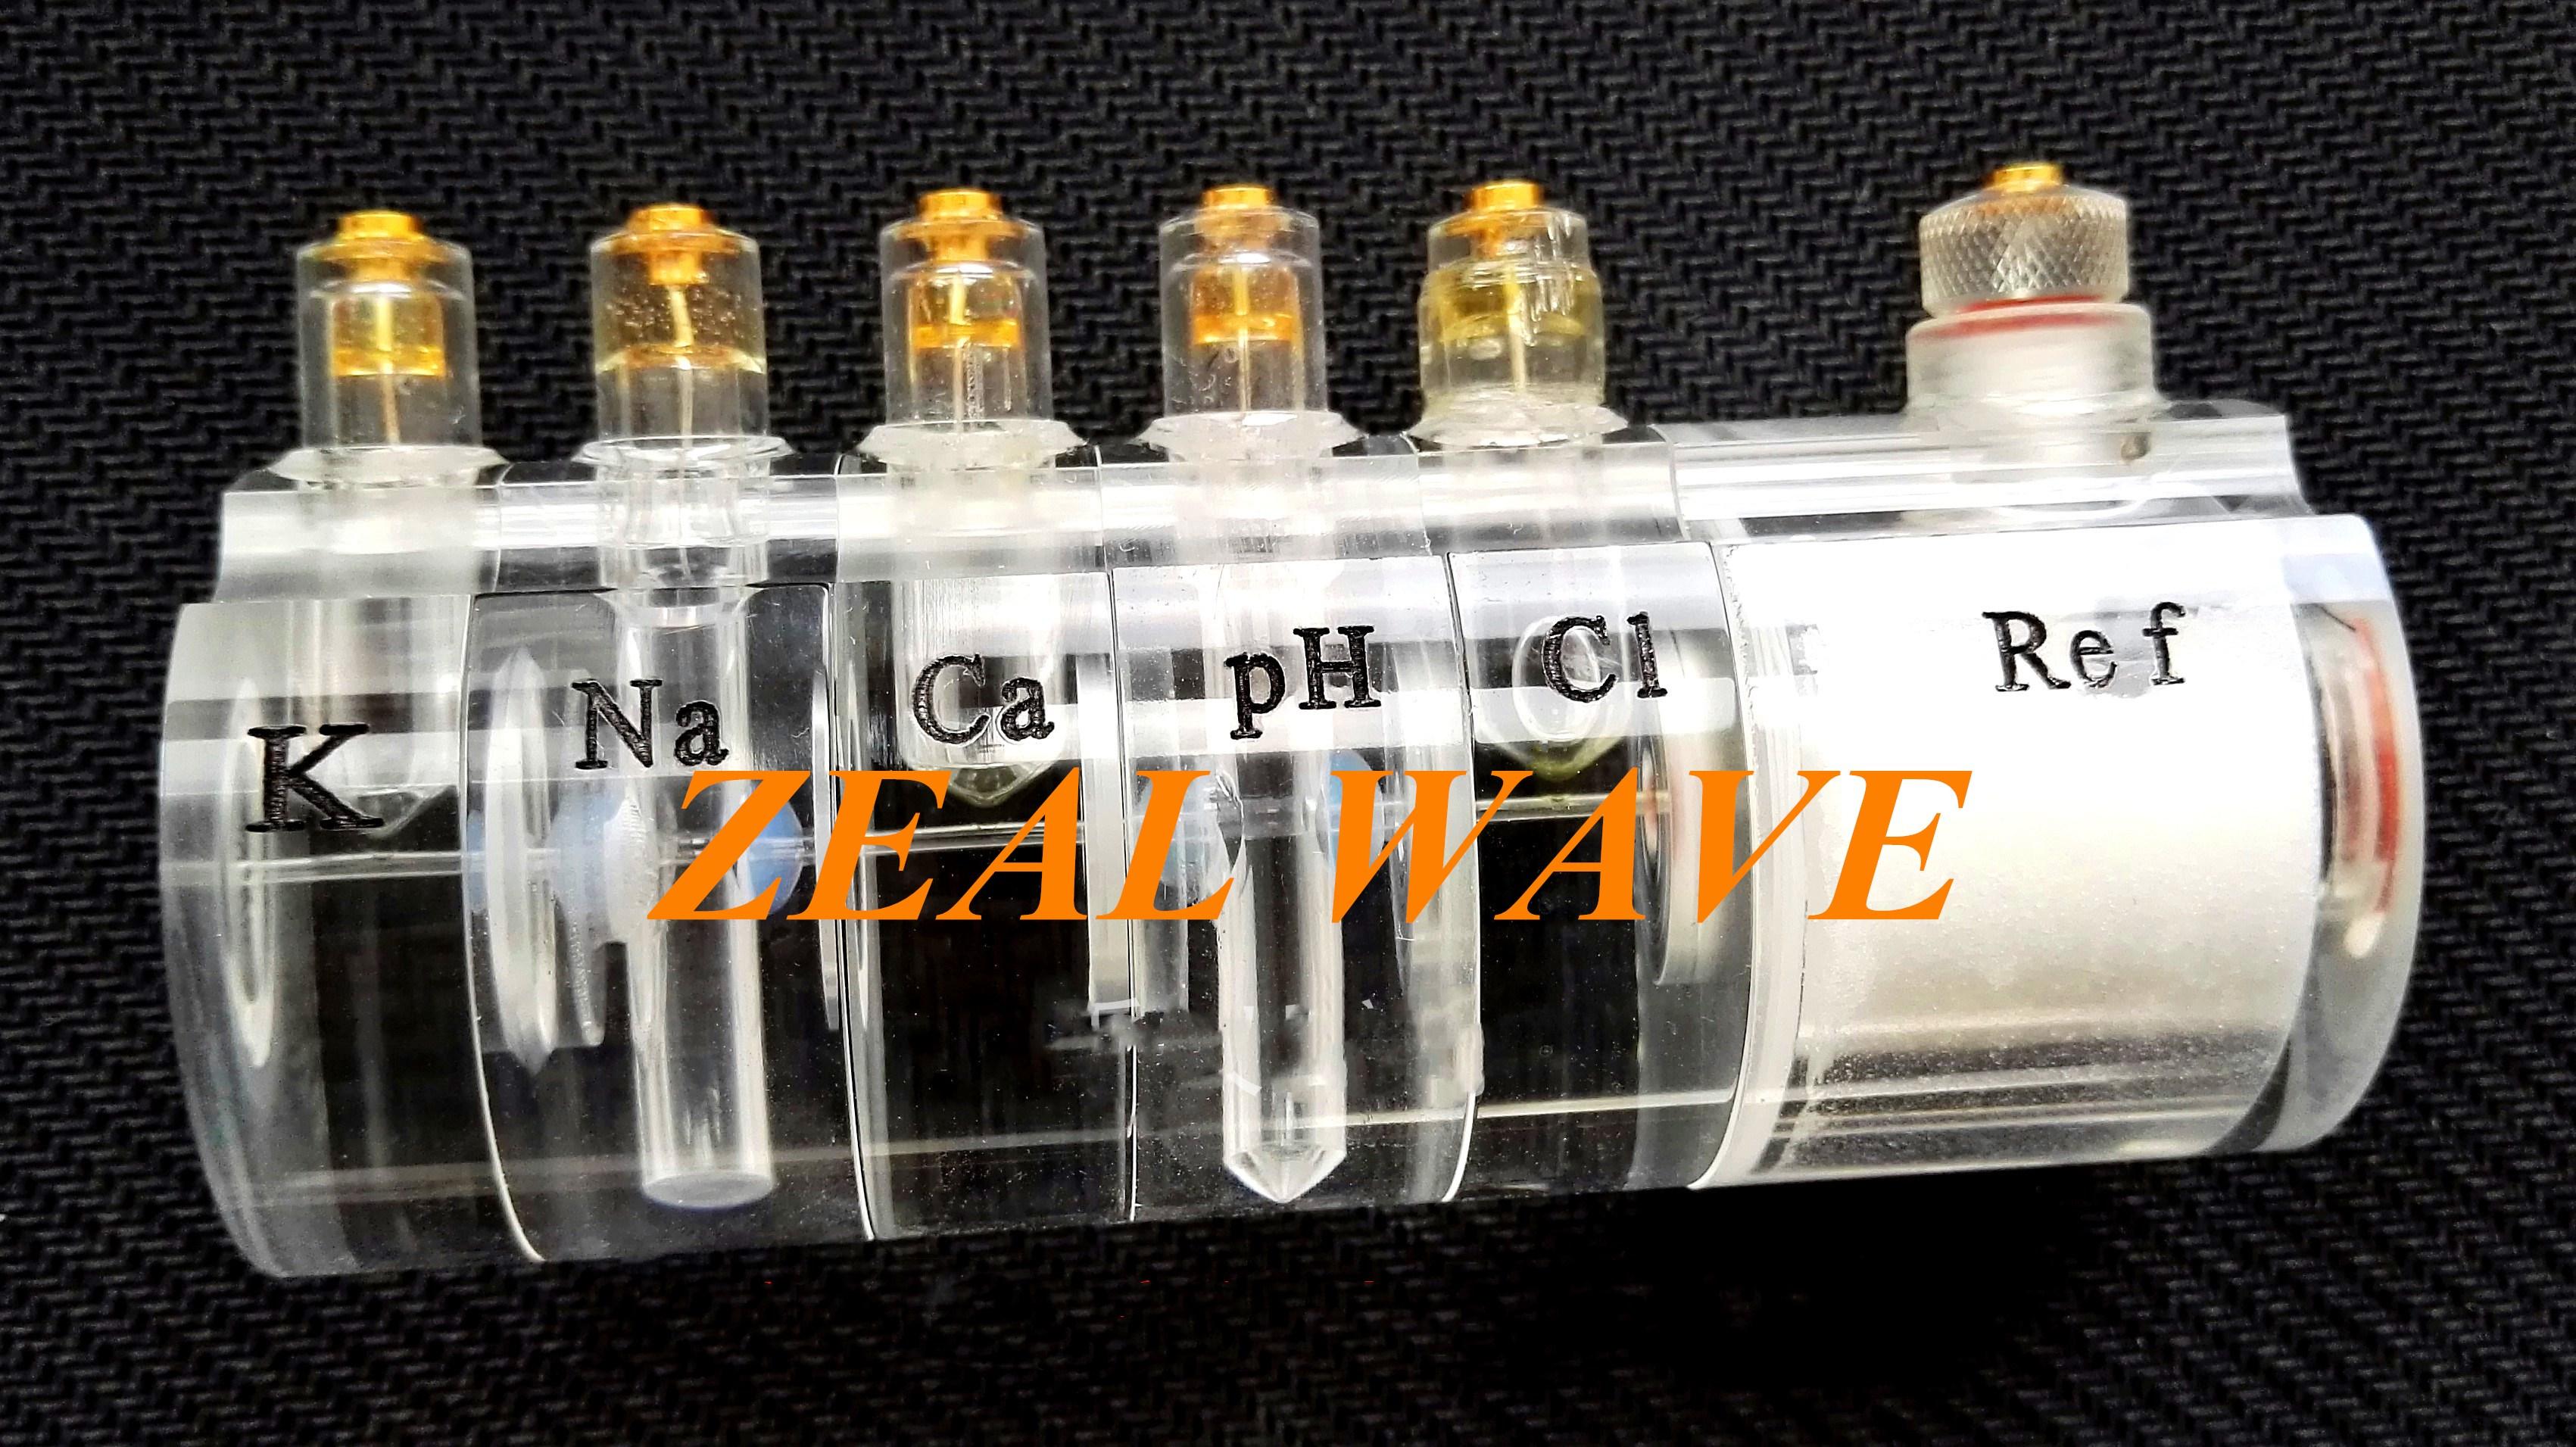 XUNDA-قطب كهربائي, موديل 685 محلل إلكترود 905 موديل K Na Cl Ca pH Ref قطب مرجعي XUNDA موديل 685 إلكتروليتي.